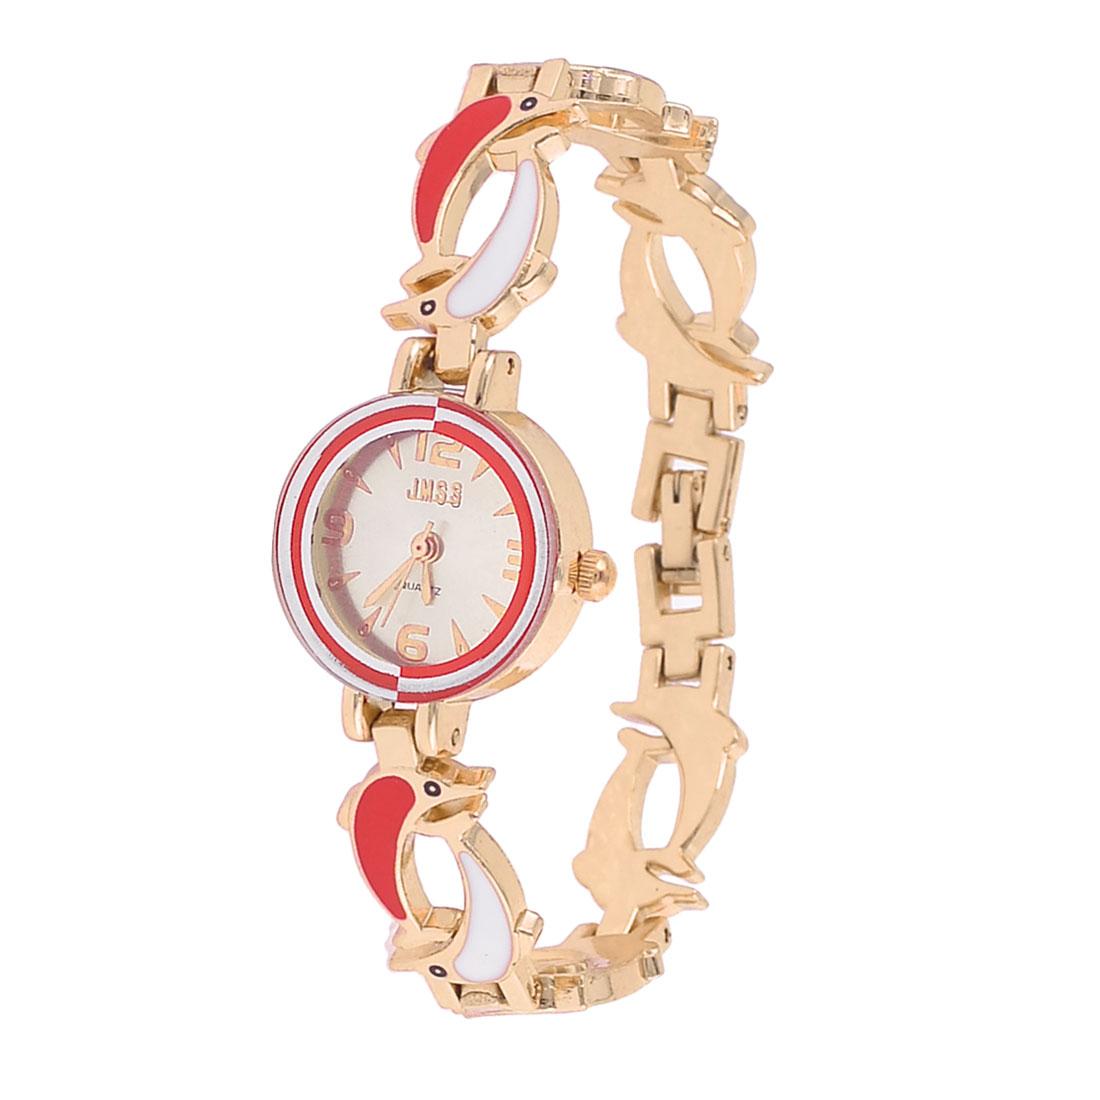 Ladies Dolphin Detail Wristband Round Dial Quartz Wrist Watch Red White